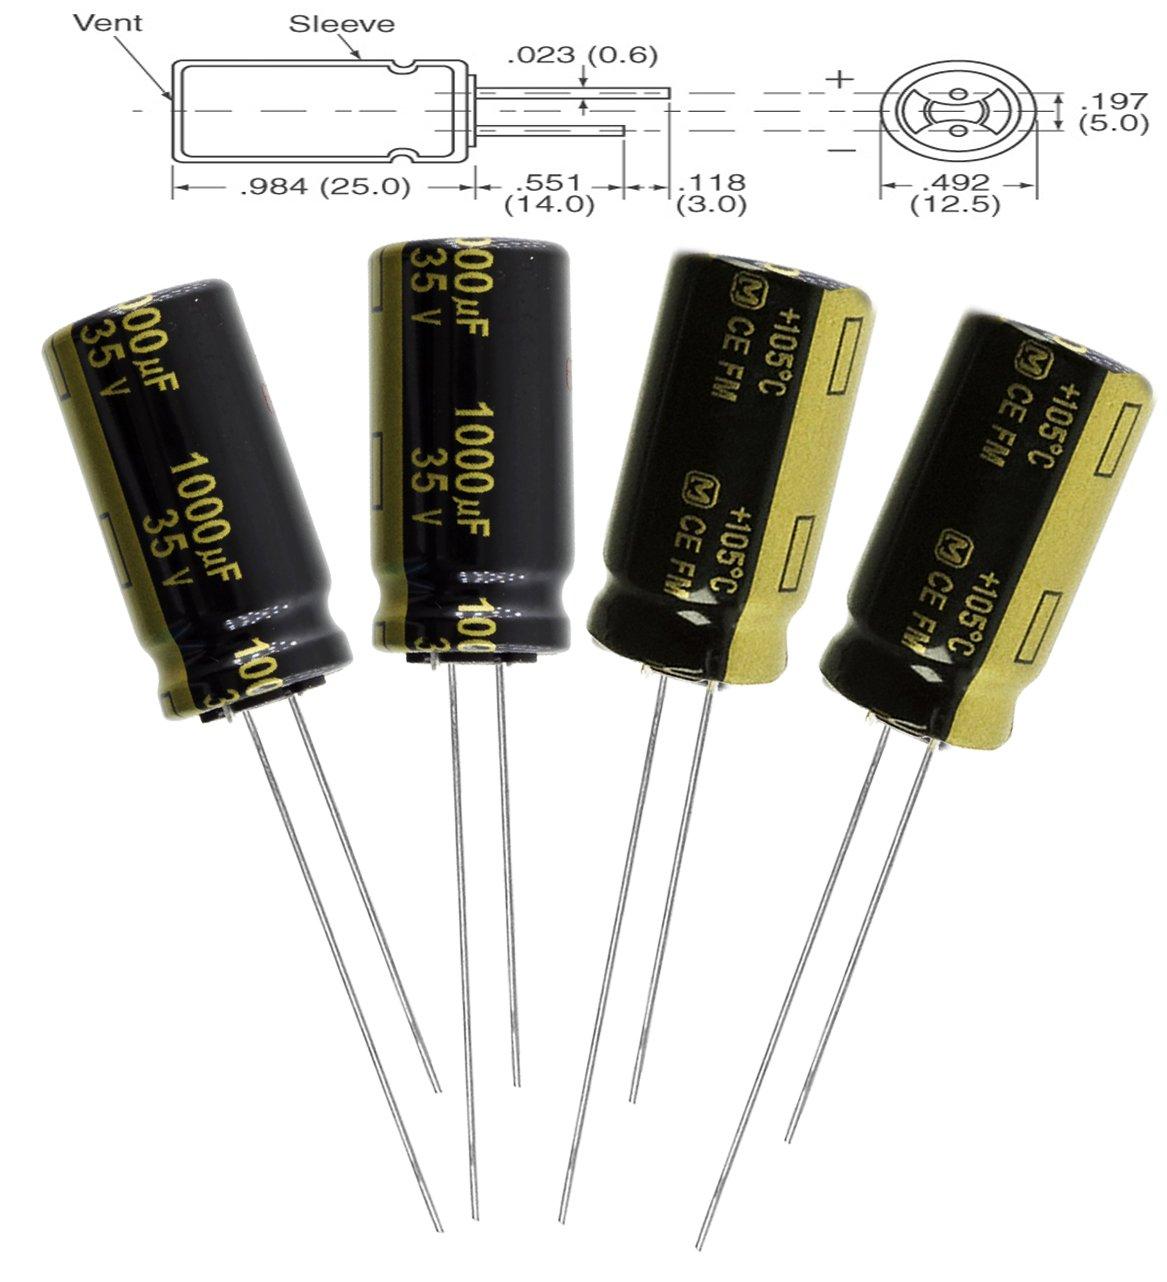 20 Aluminum Electrolytic Capacitors Leaded 1000uF 50V 20/%